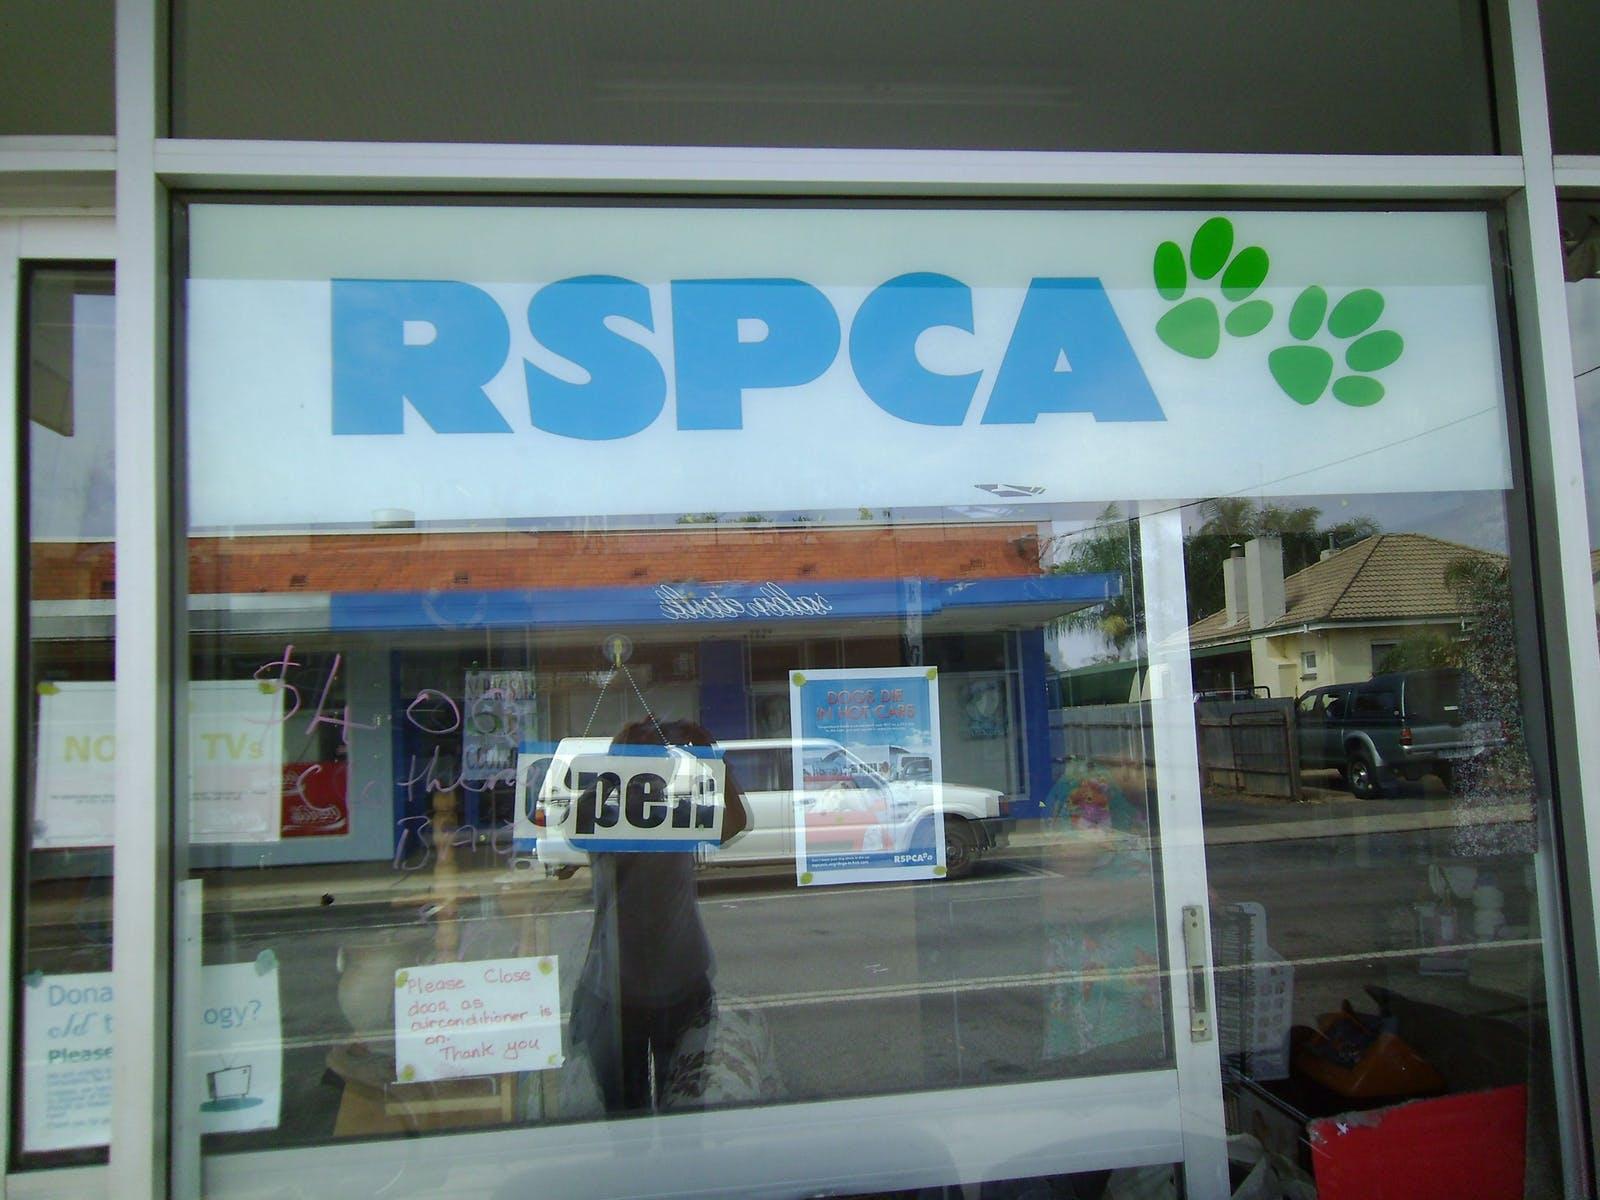 R.S.P.C.A Opportunity Shop